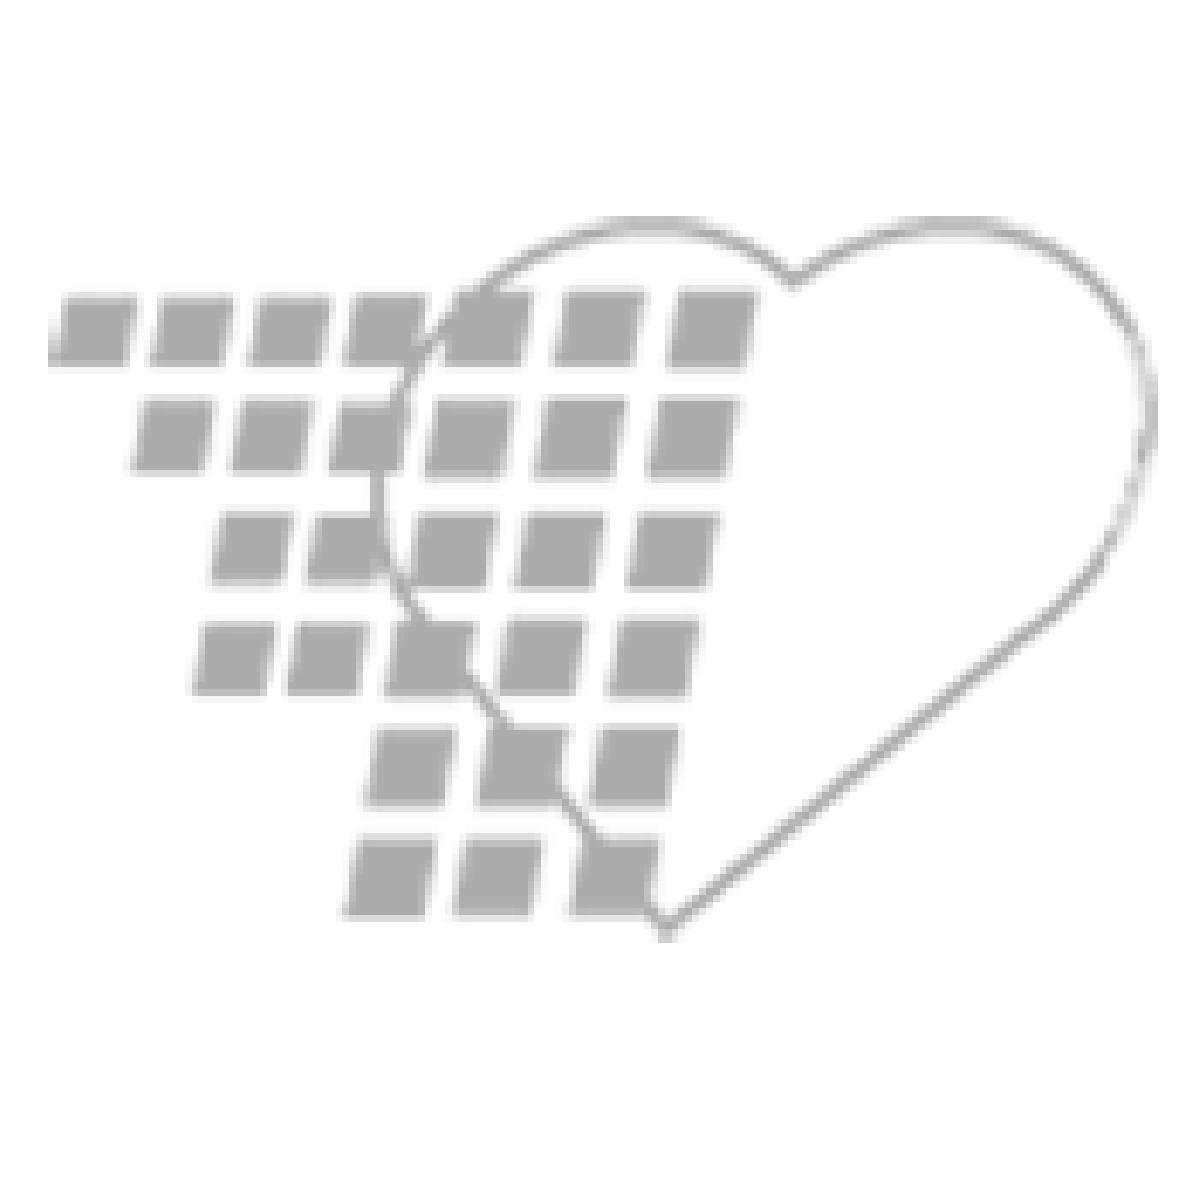 06-93-1130 - Demo Dose® Epinephrn 10mL